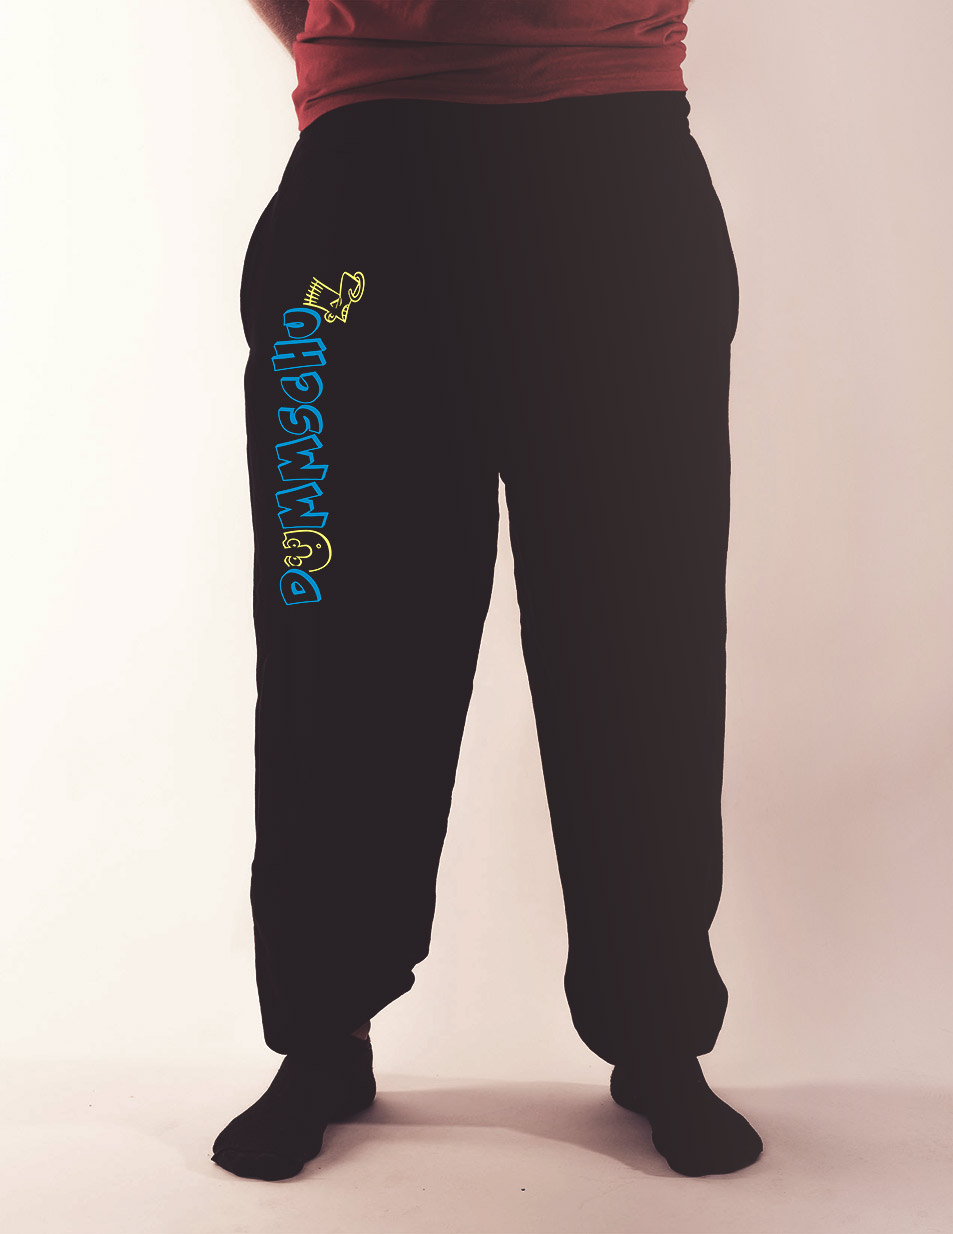 Herren-Jogginghose Dummschul mehrfarbig auf schwarz